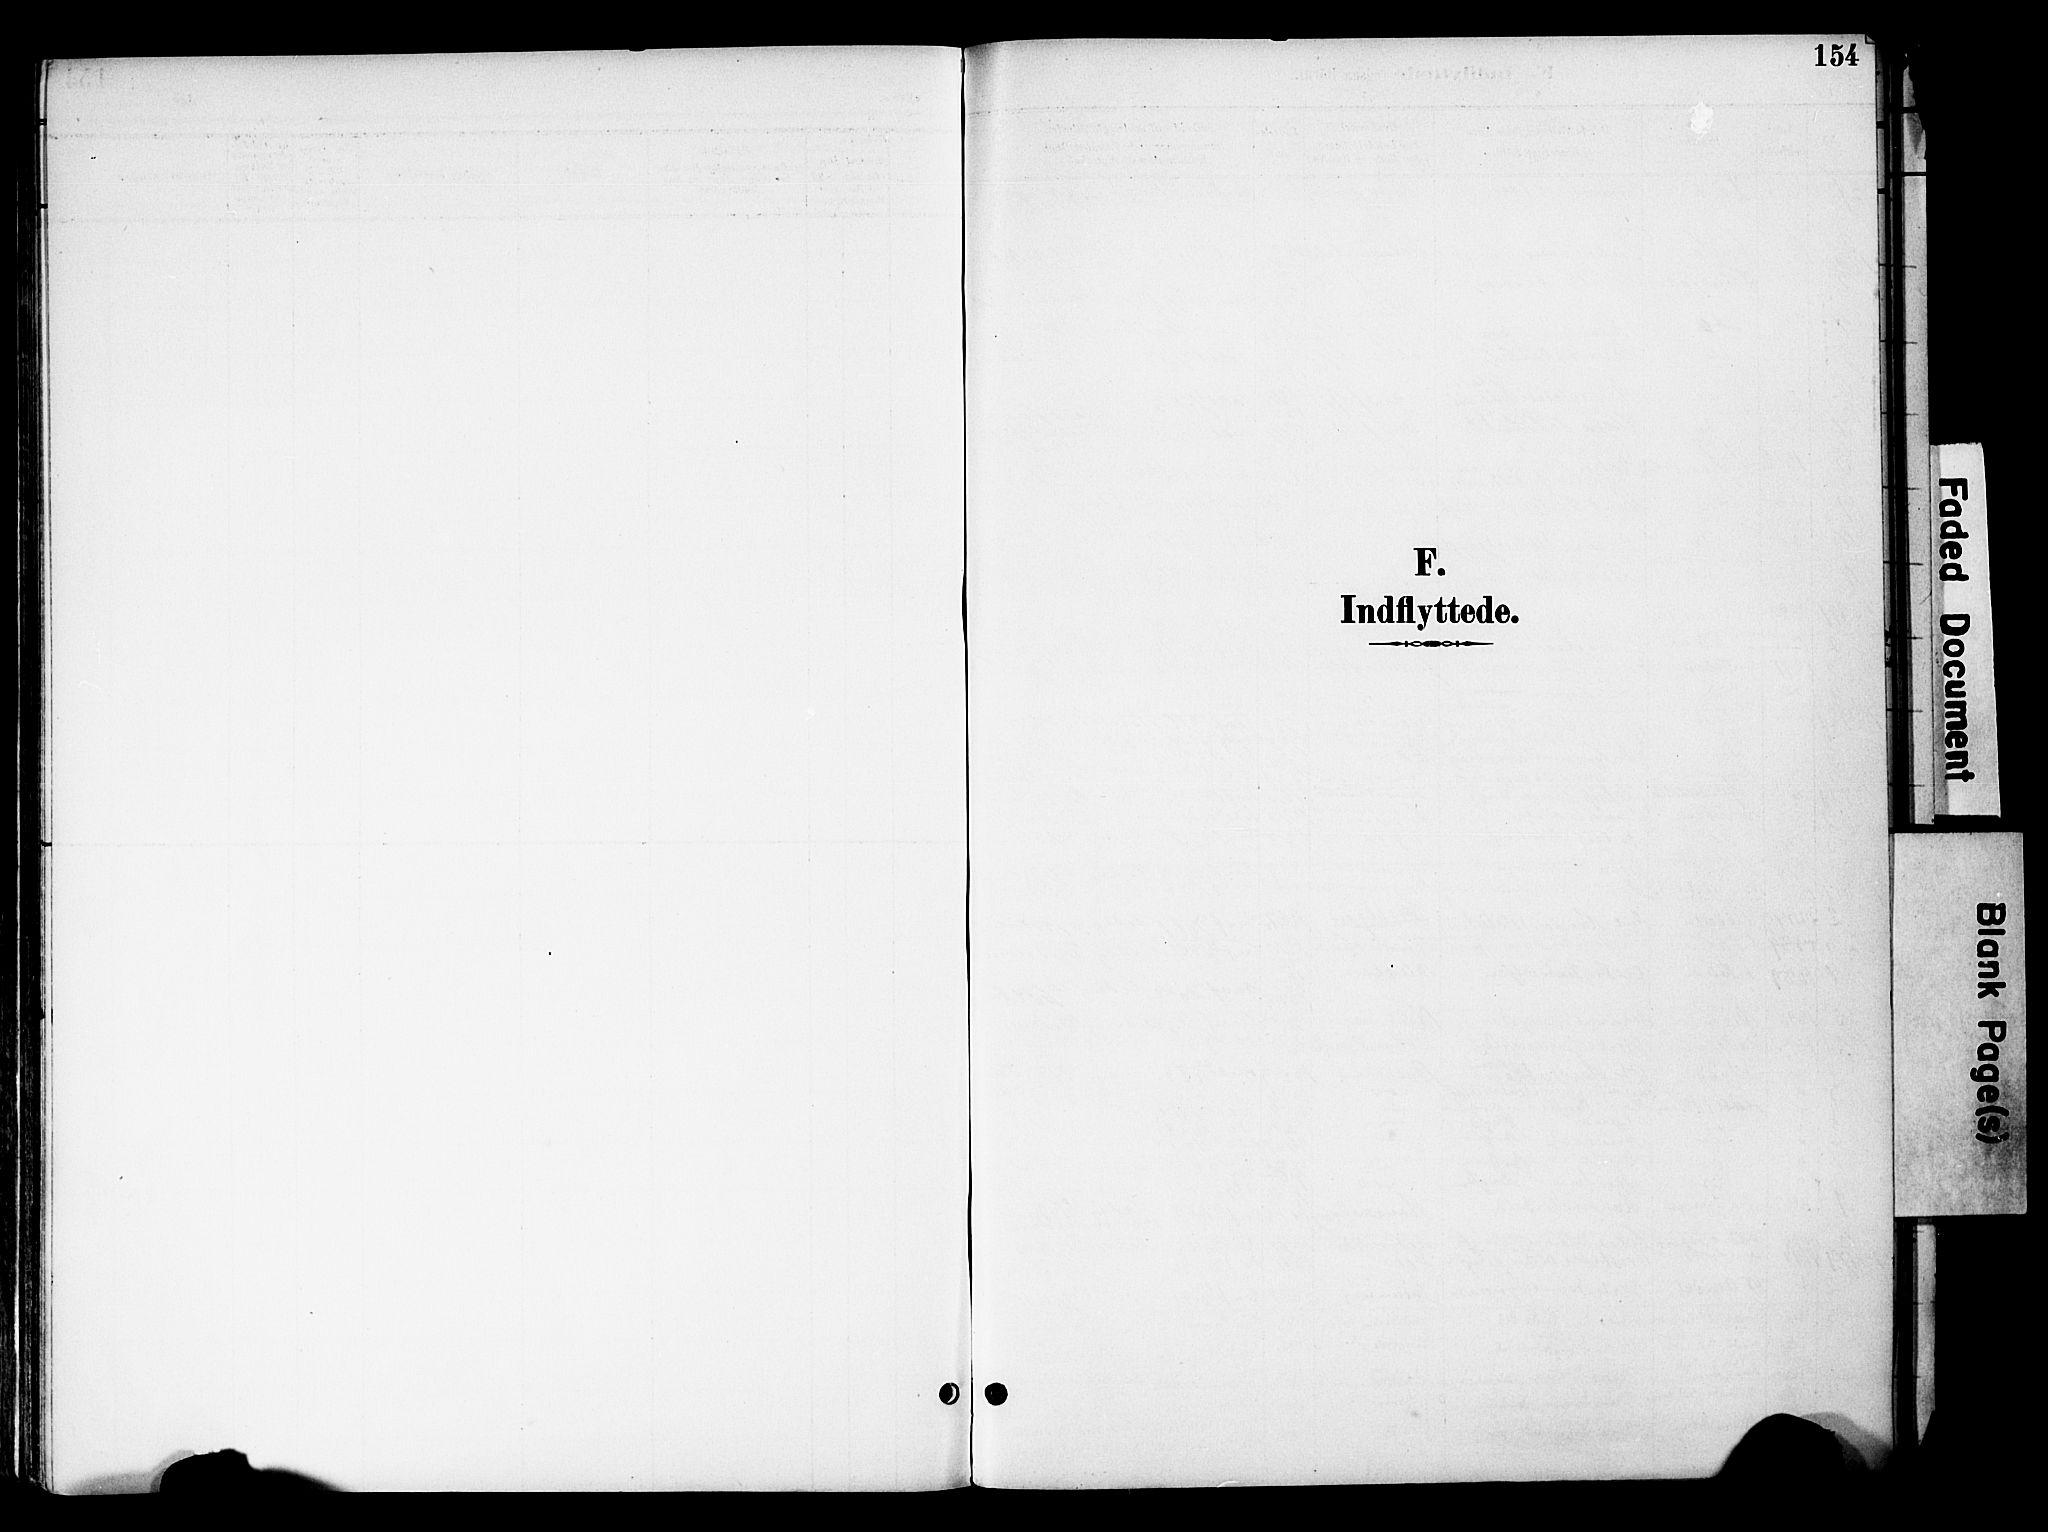 SAH, Gran prestekontor, Ministerialbok nr. 20, 1889-1899, s. 154